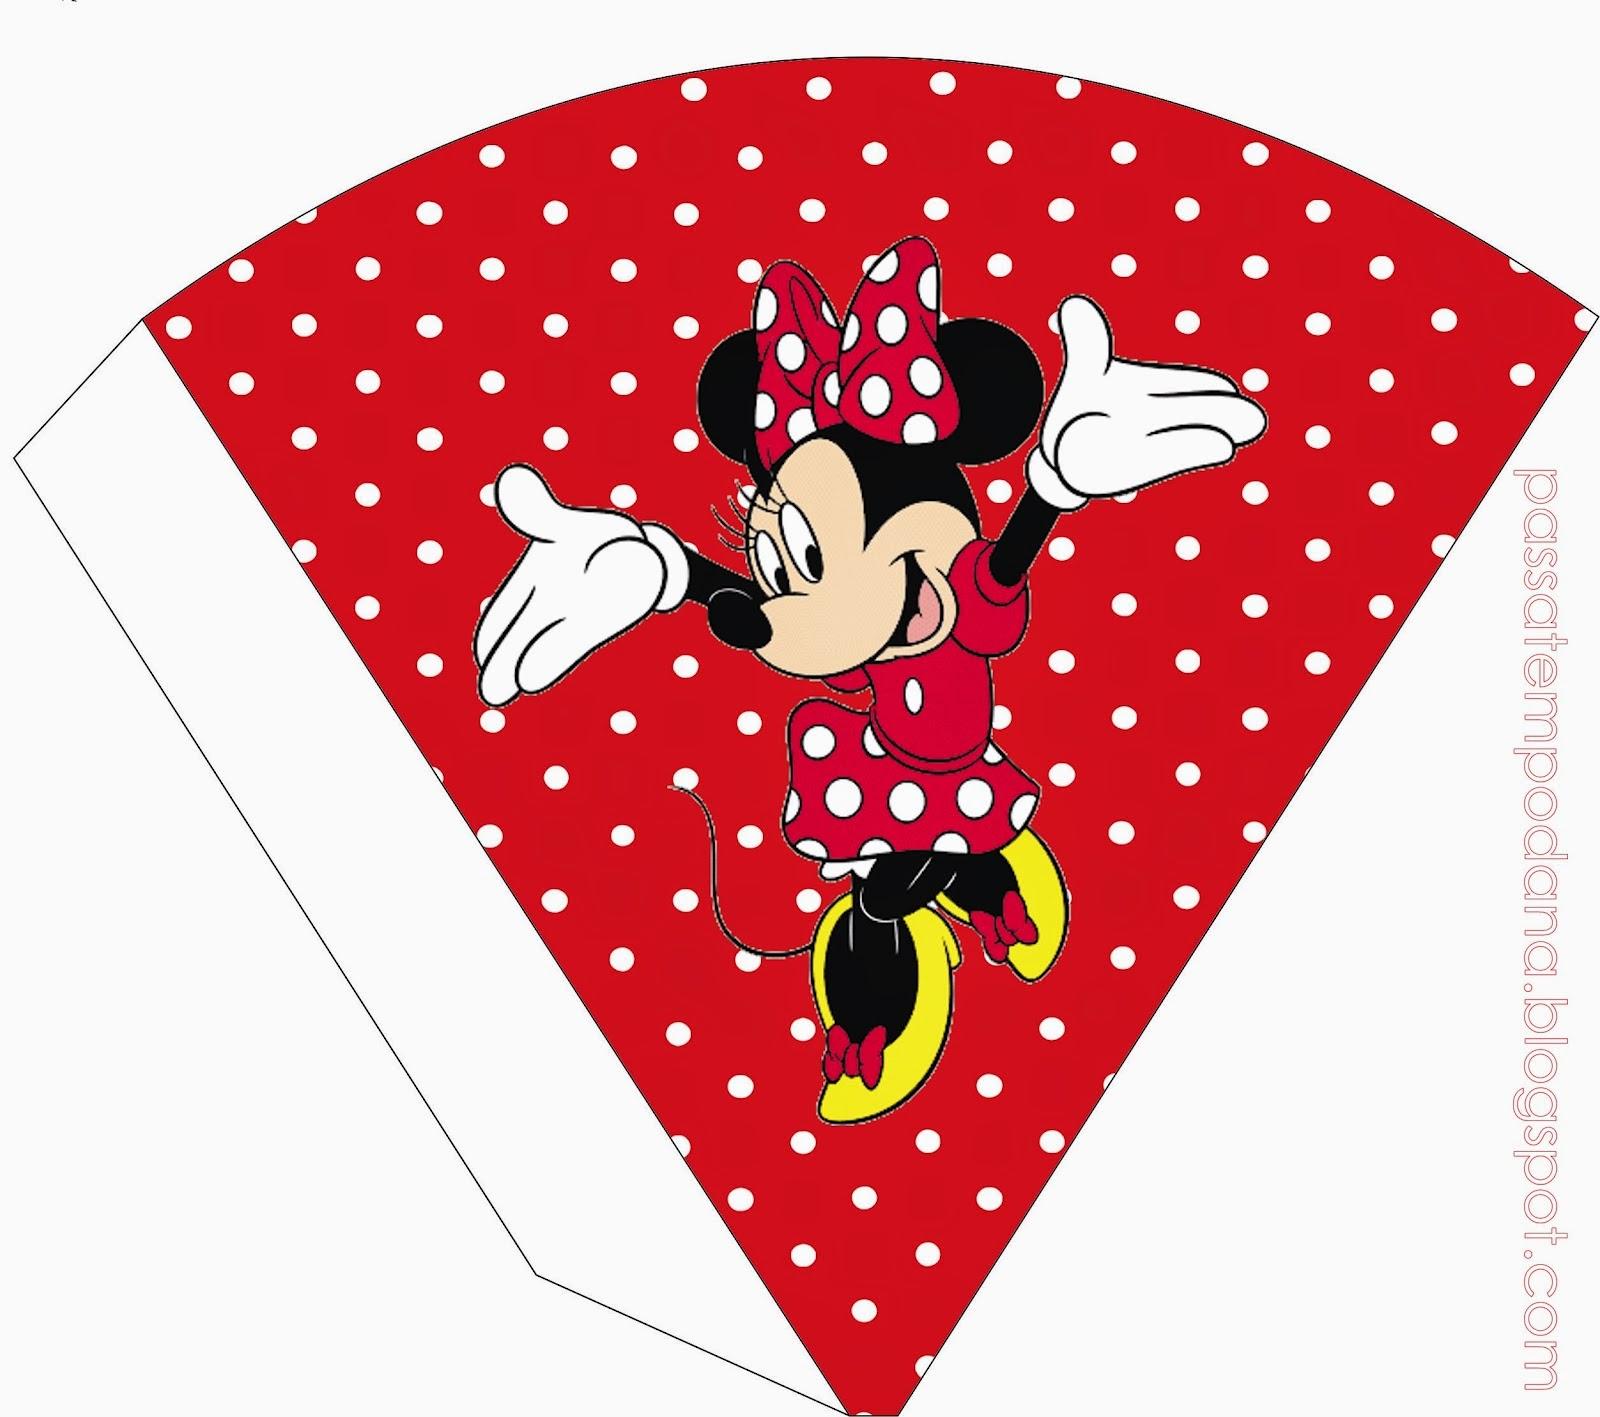 Invitaciones de Minnie Mouse Gratis - fiestaideasclub.com